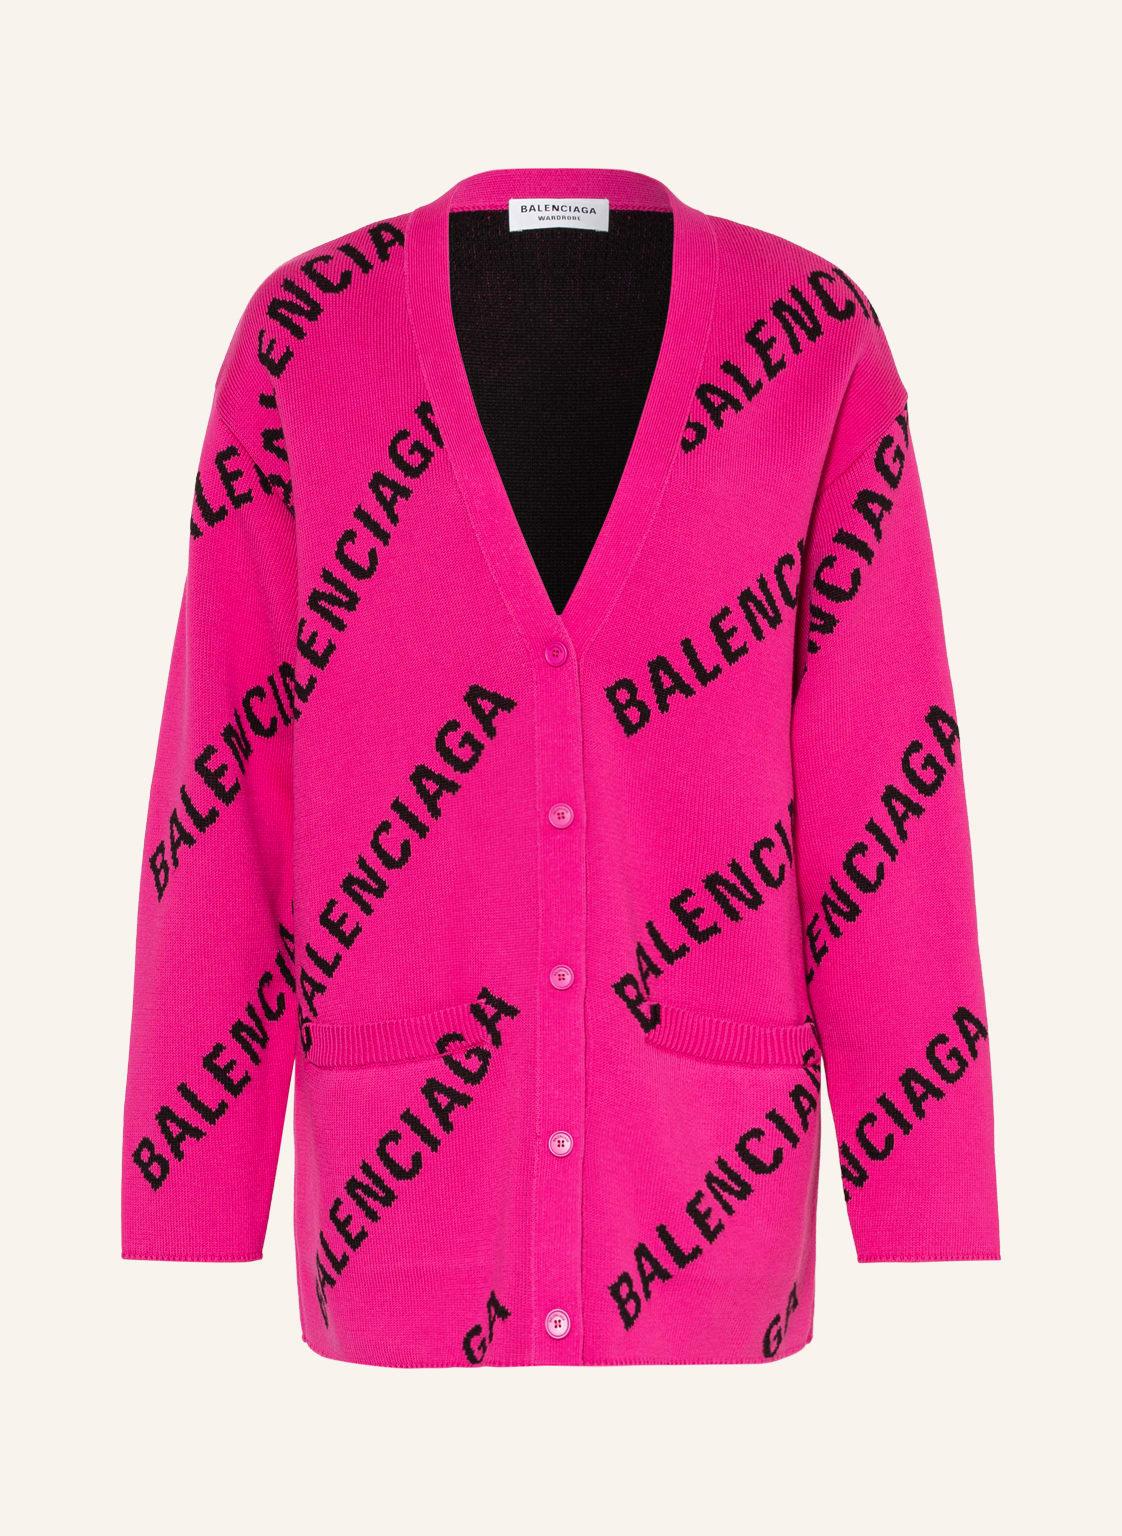 Balenciaga Oversized-Cardigan pink